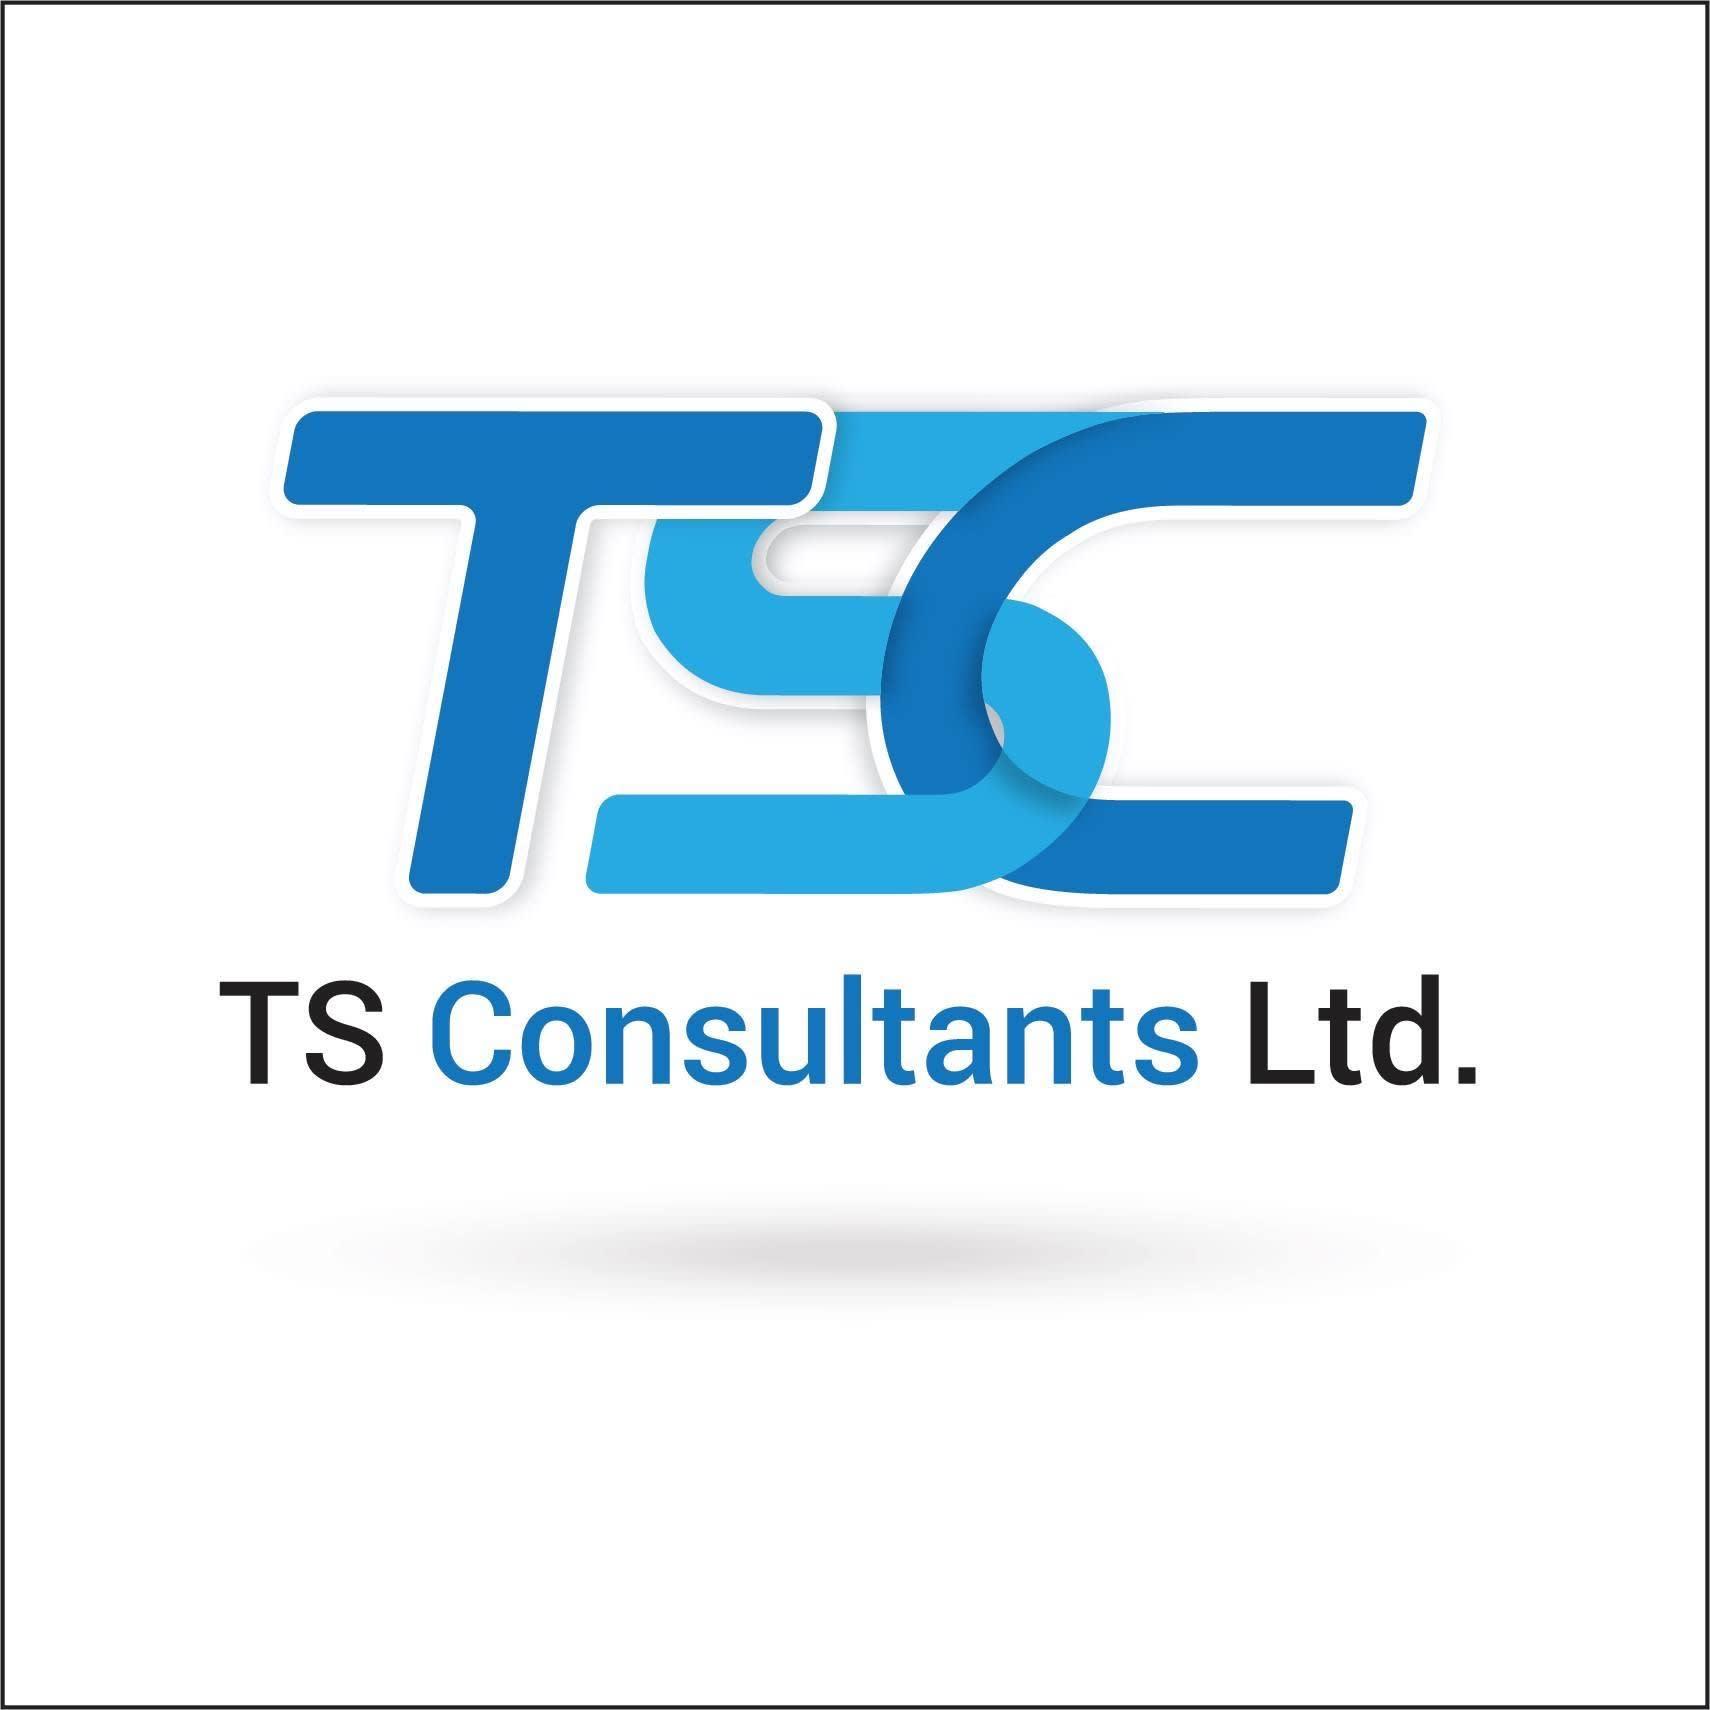 T S Consultants LTD